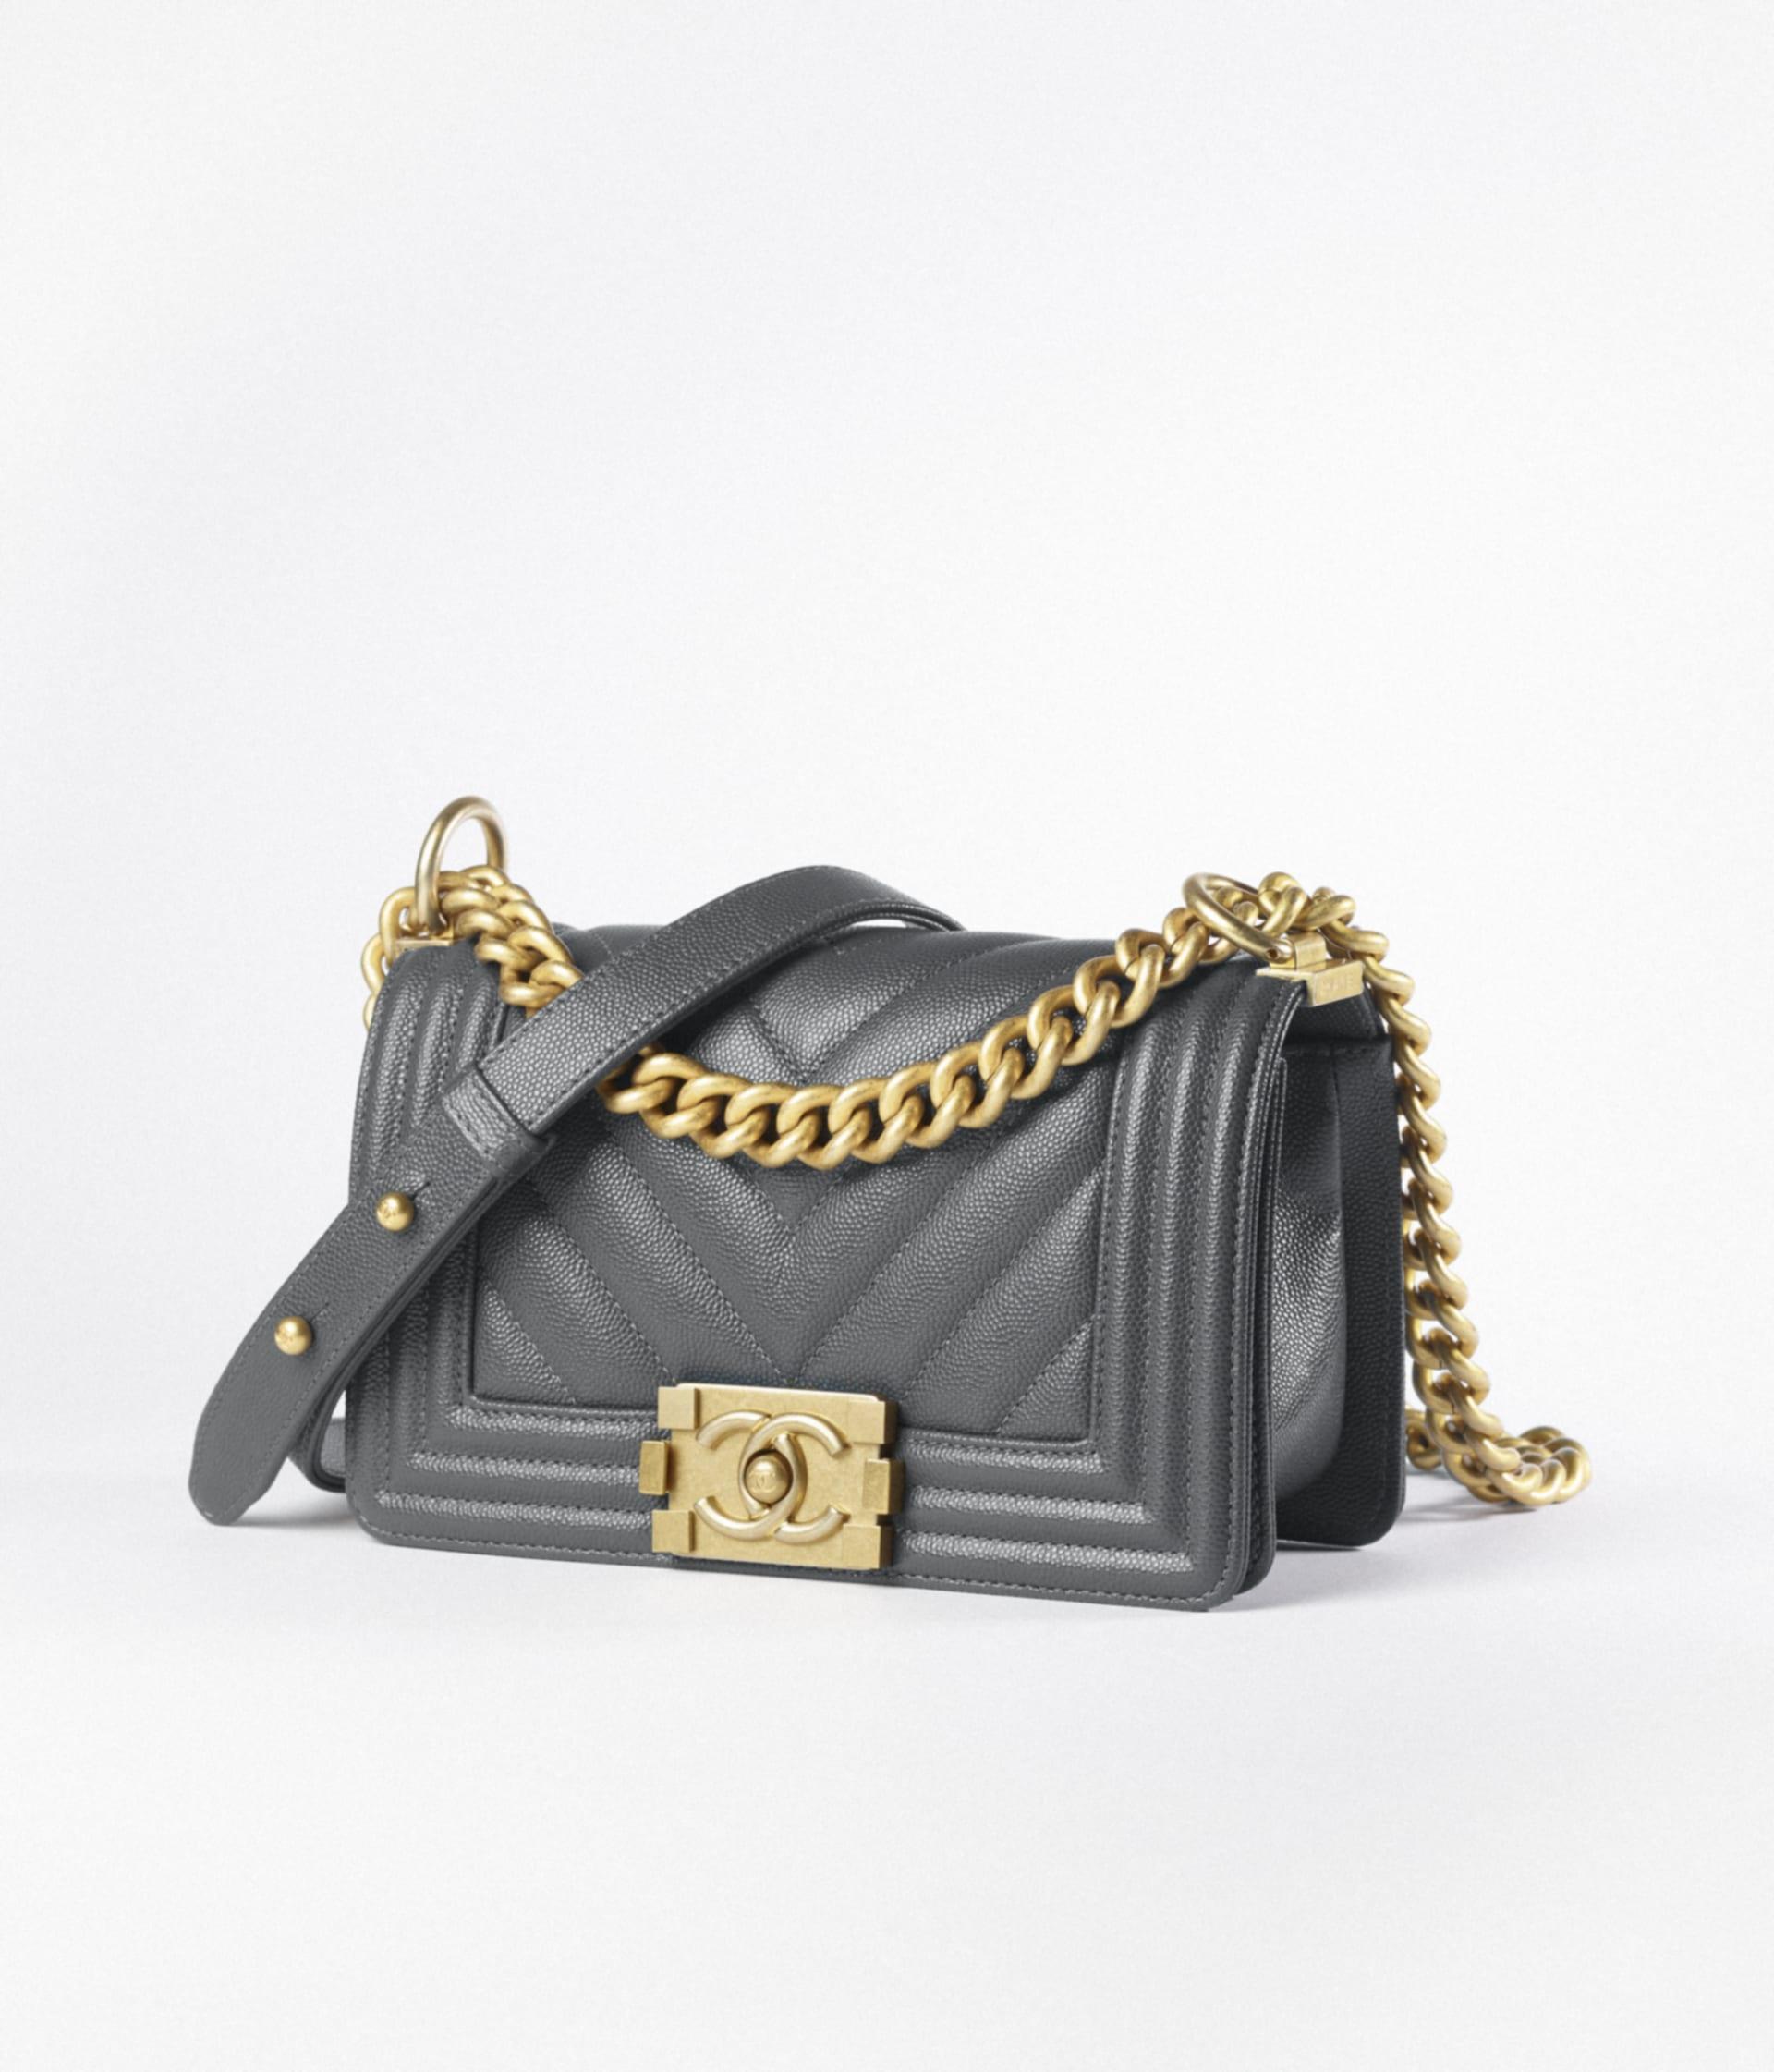 image 2 - Small BOY CHANEL Handbag - Grained Calfskin & Gold-Tone Metal - Dark Gray